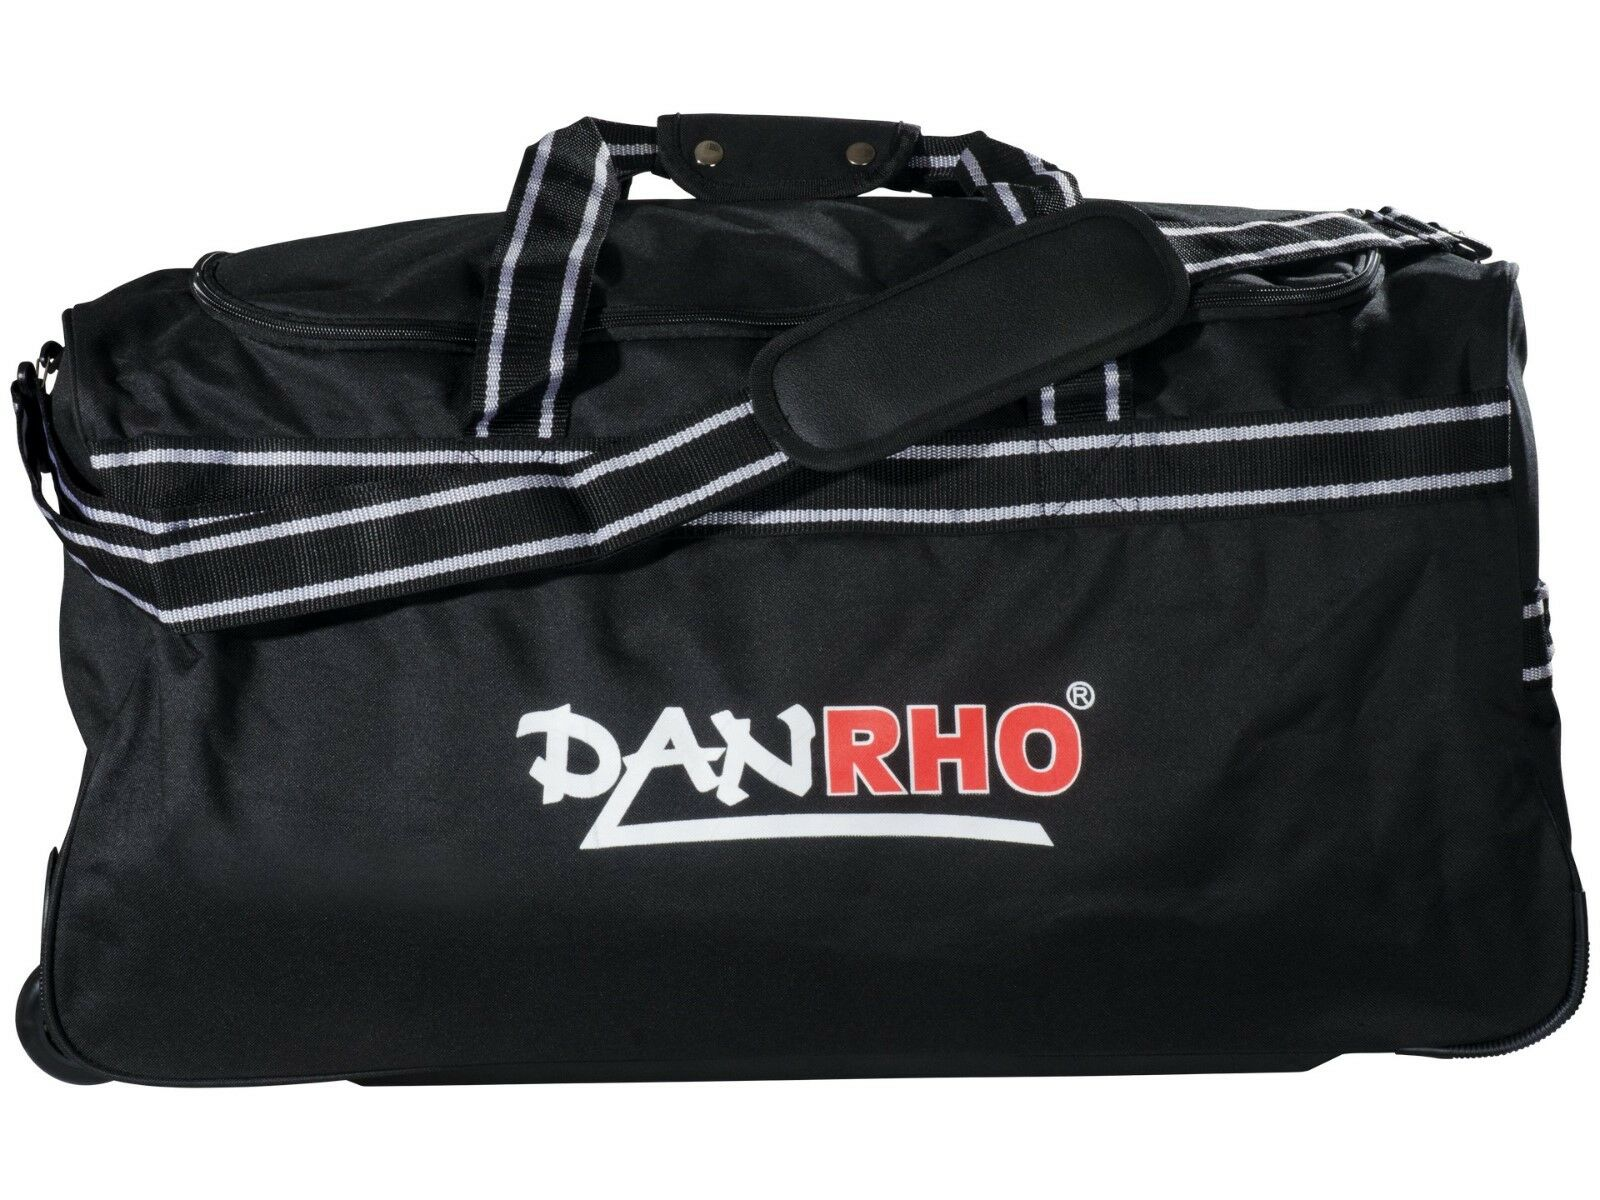 Danroh roll bolso, 743736 CM, artes marciales, fitness, MMA, deporte, ocio